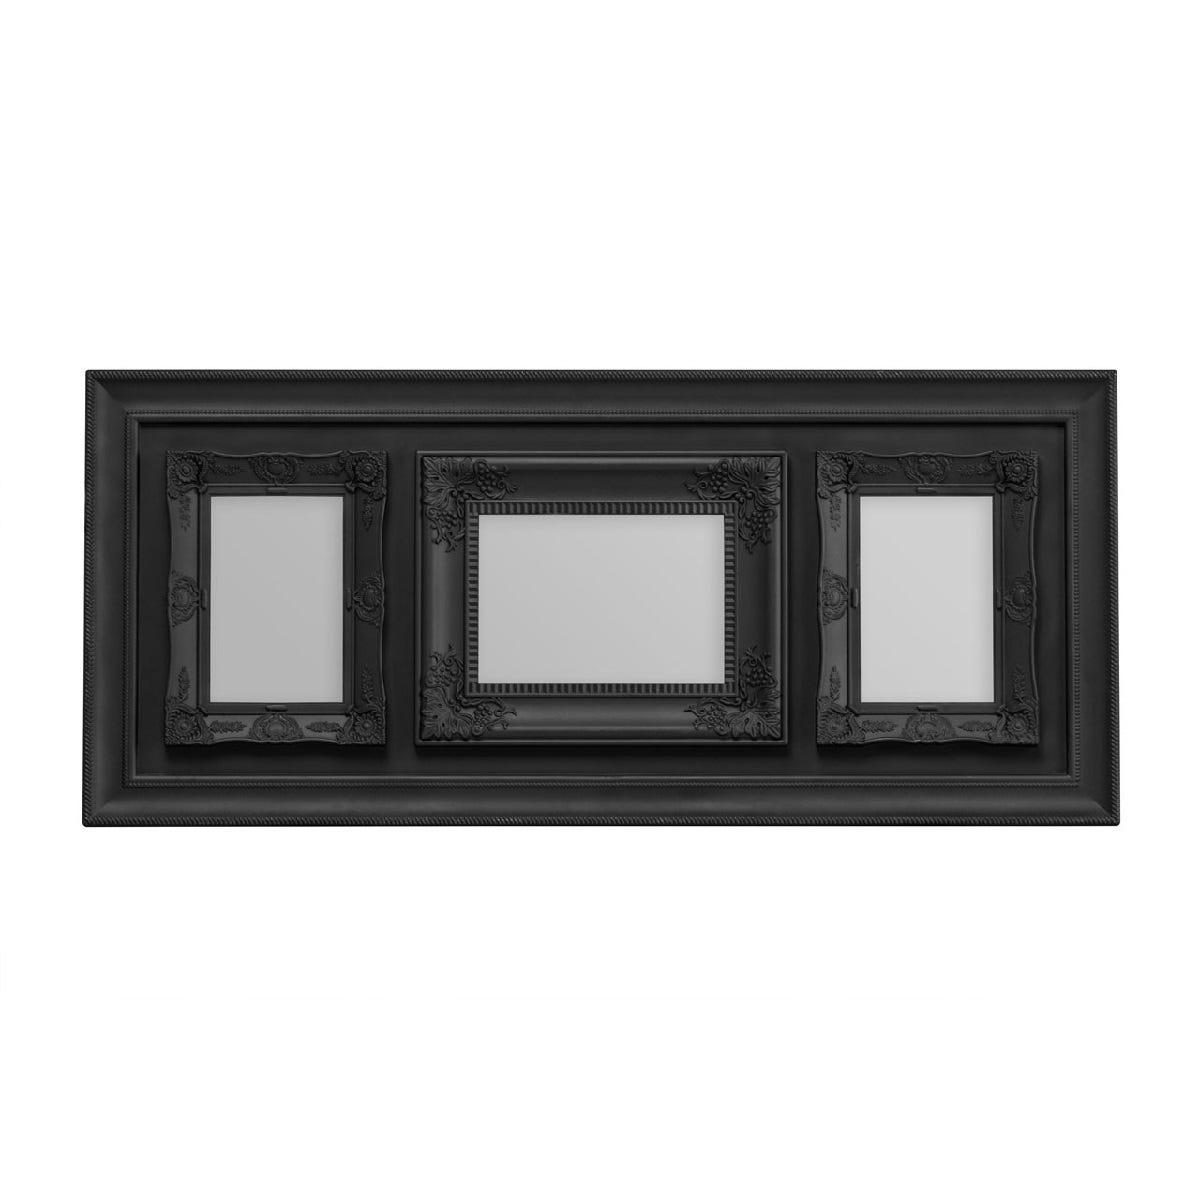 "Premier Housewares Multi Frame 3 Photo Black Plastic Vintage Style Frame - 1 of 5 x 7"", 2 of 4 x 6"""